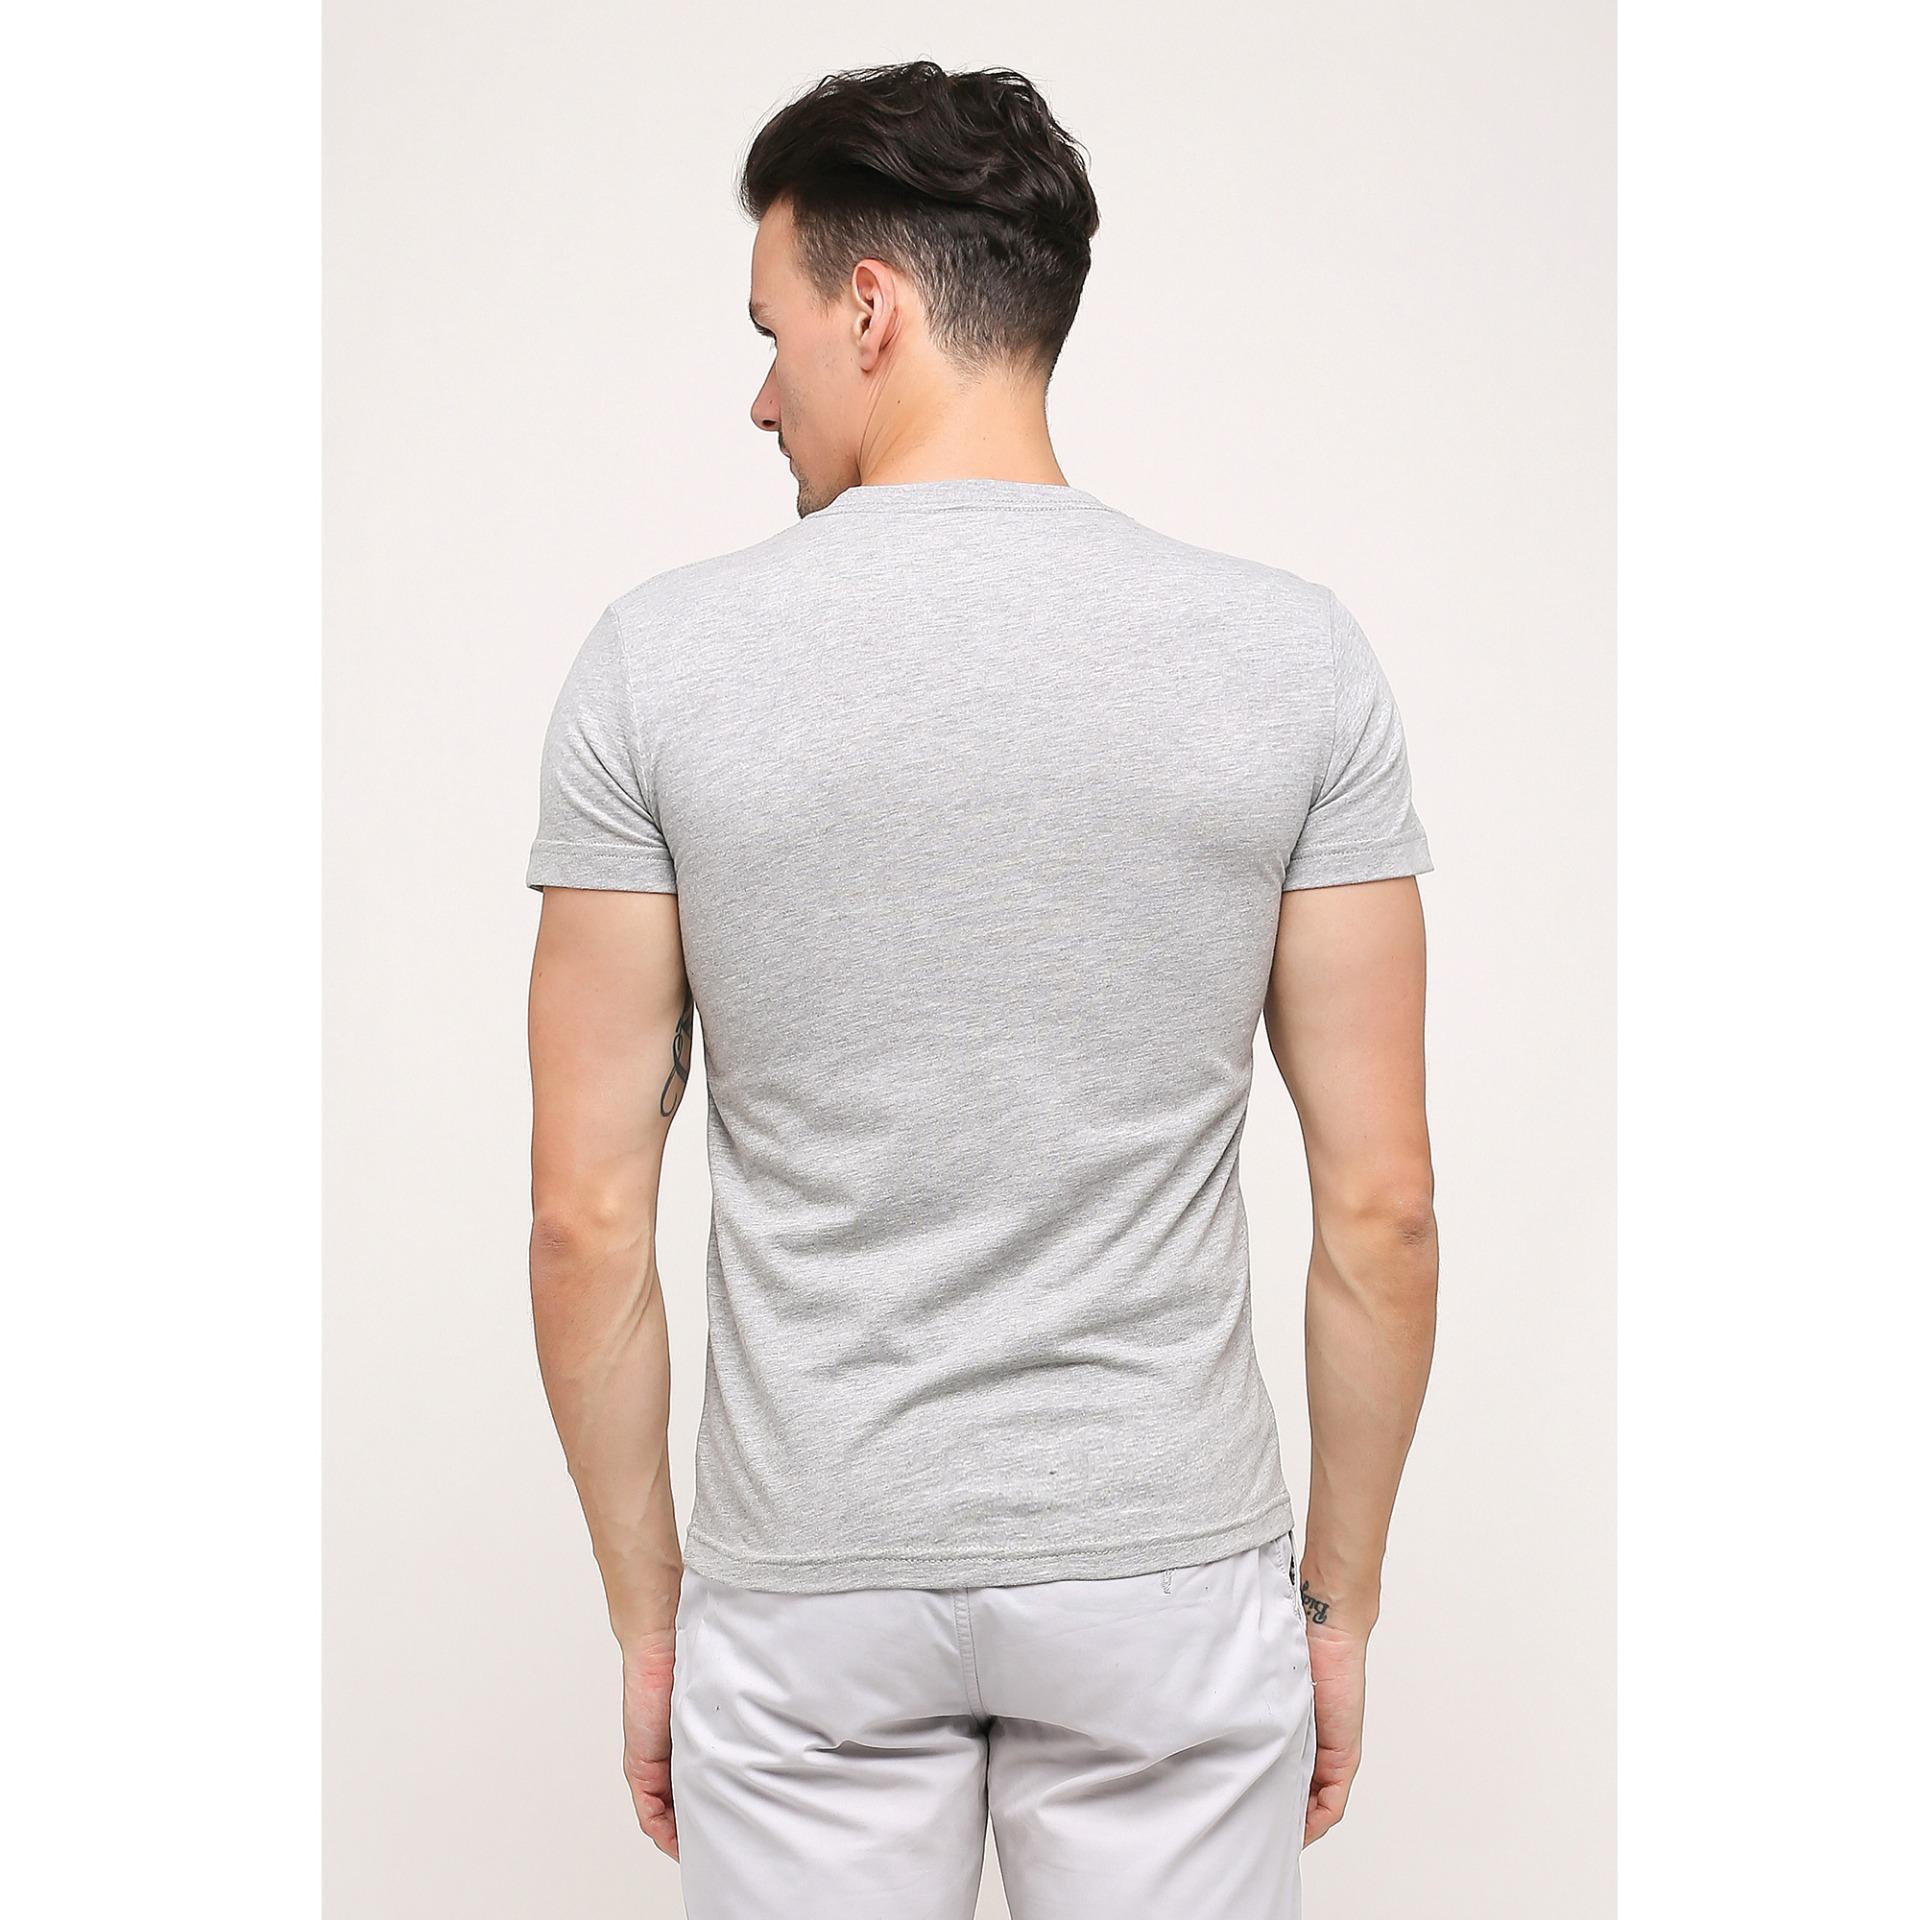 Gt Man T Shirt V Neck Abu Daftar Harga Terlengkap Indonesia Enzoro Pakaian Olahraga Pria Revino Anthracite Grey Muda M Tshirt Tvsm